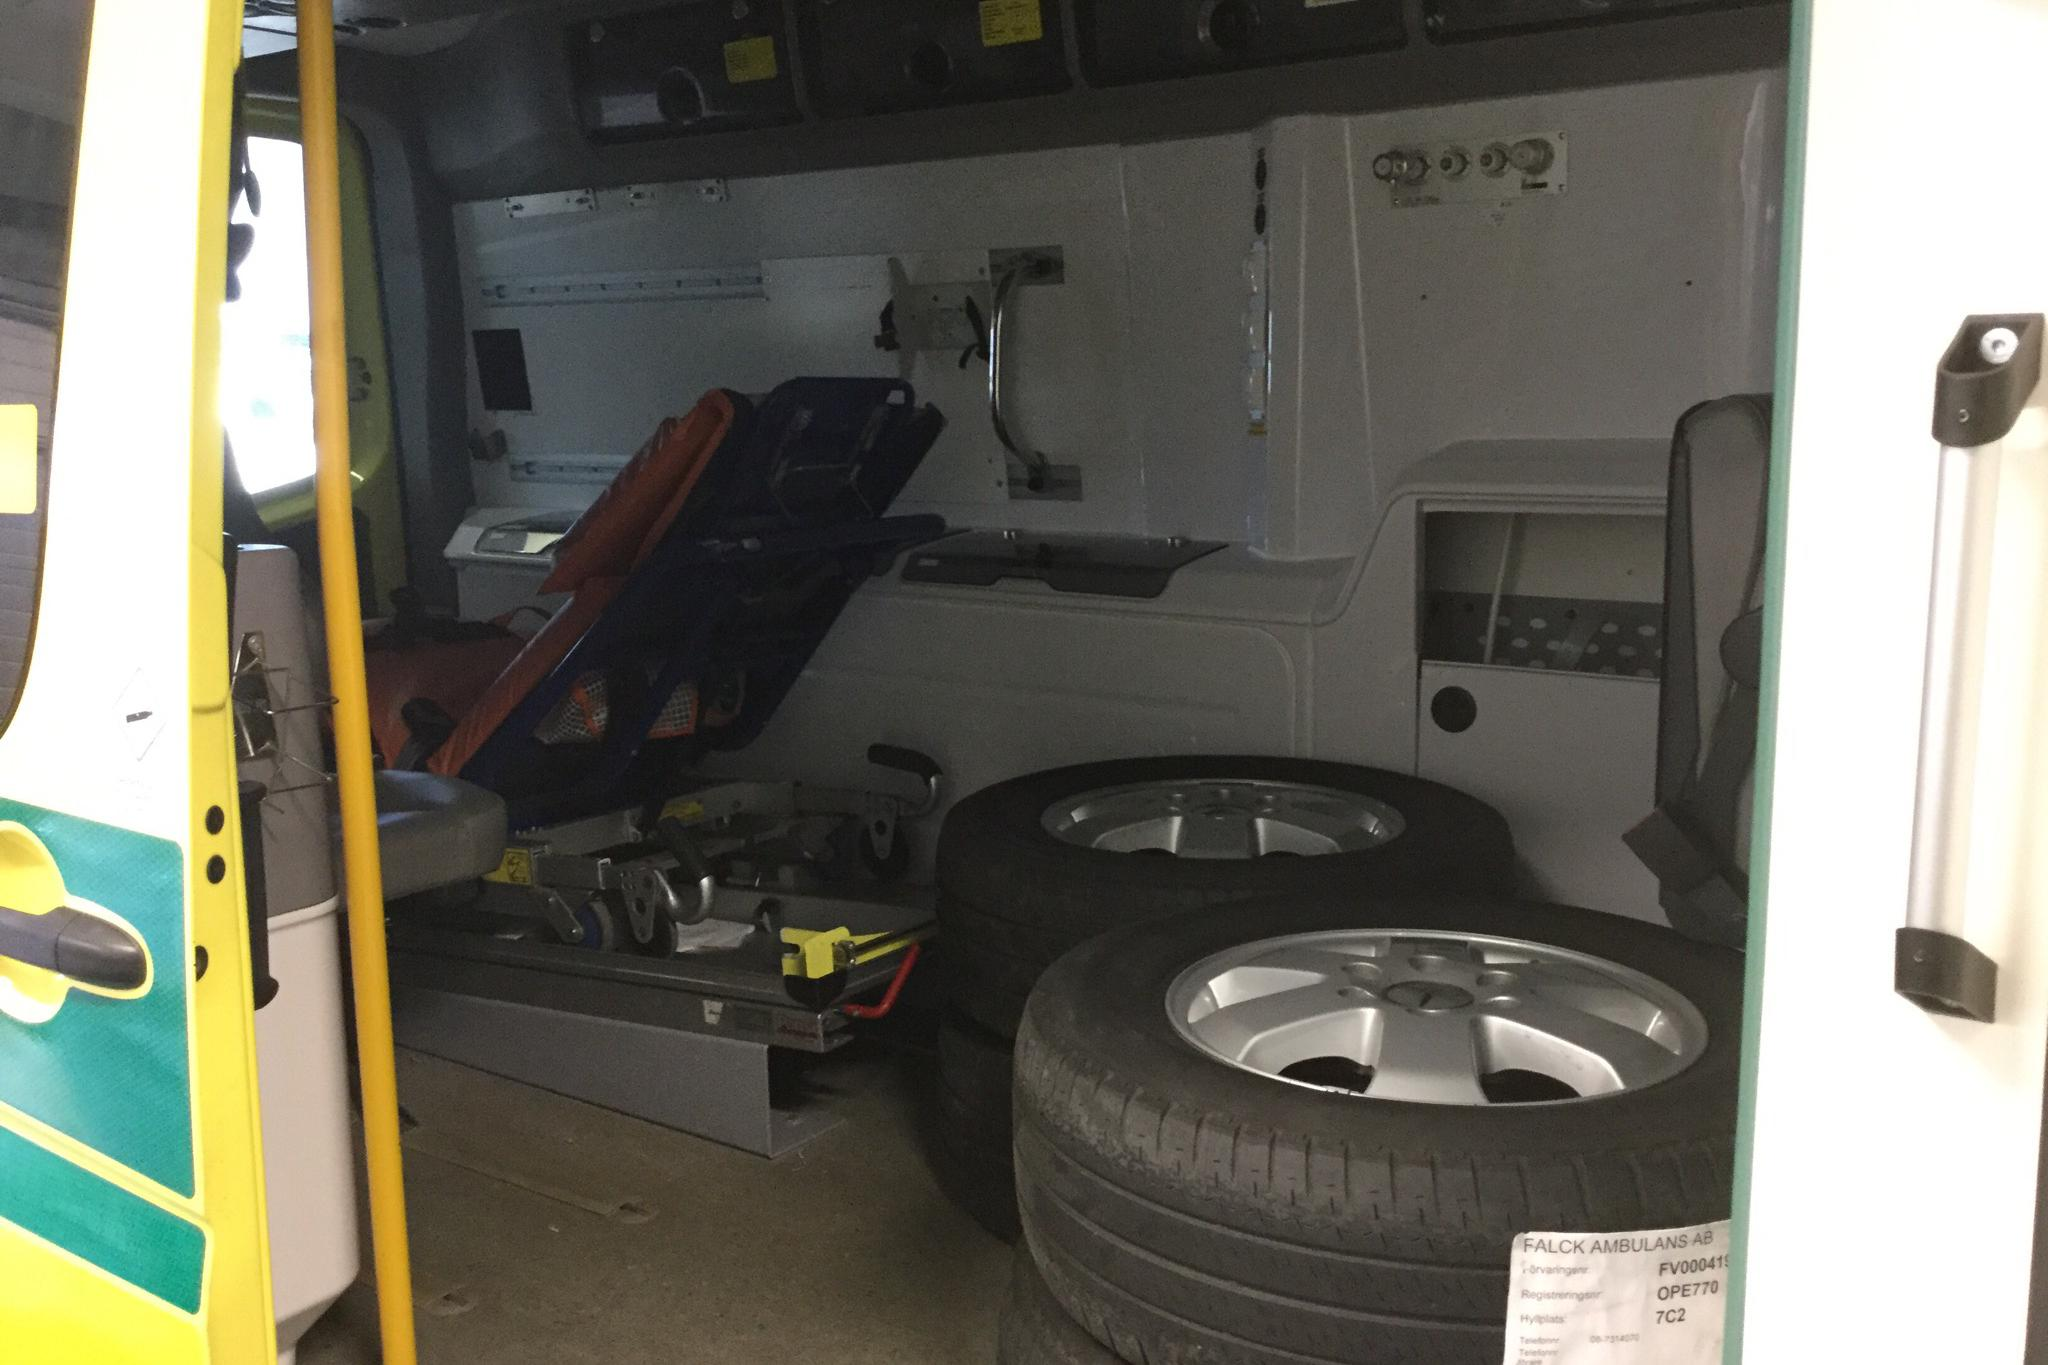 Mercedes Sprinter Ambulans 316 CDI (163hk) - 54 541 mil - Automat - gul - 2014